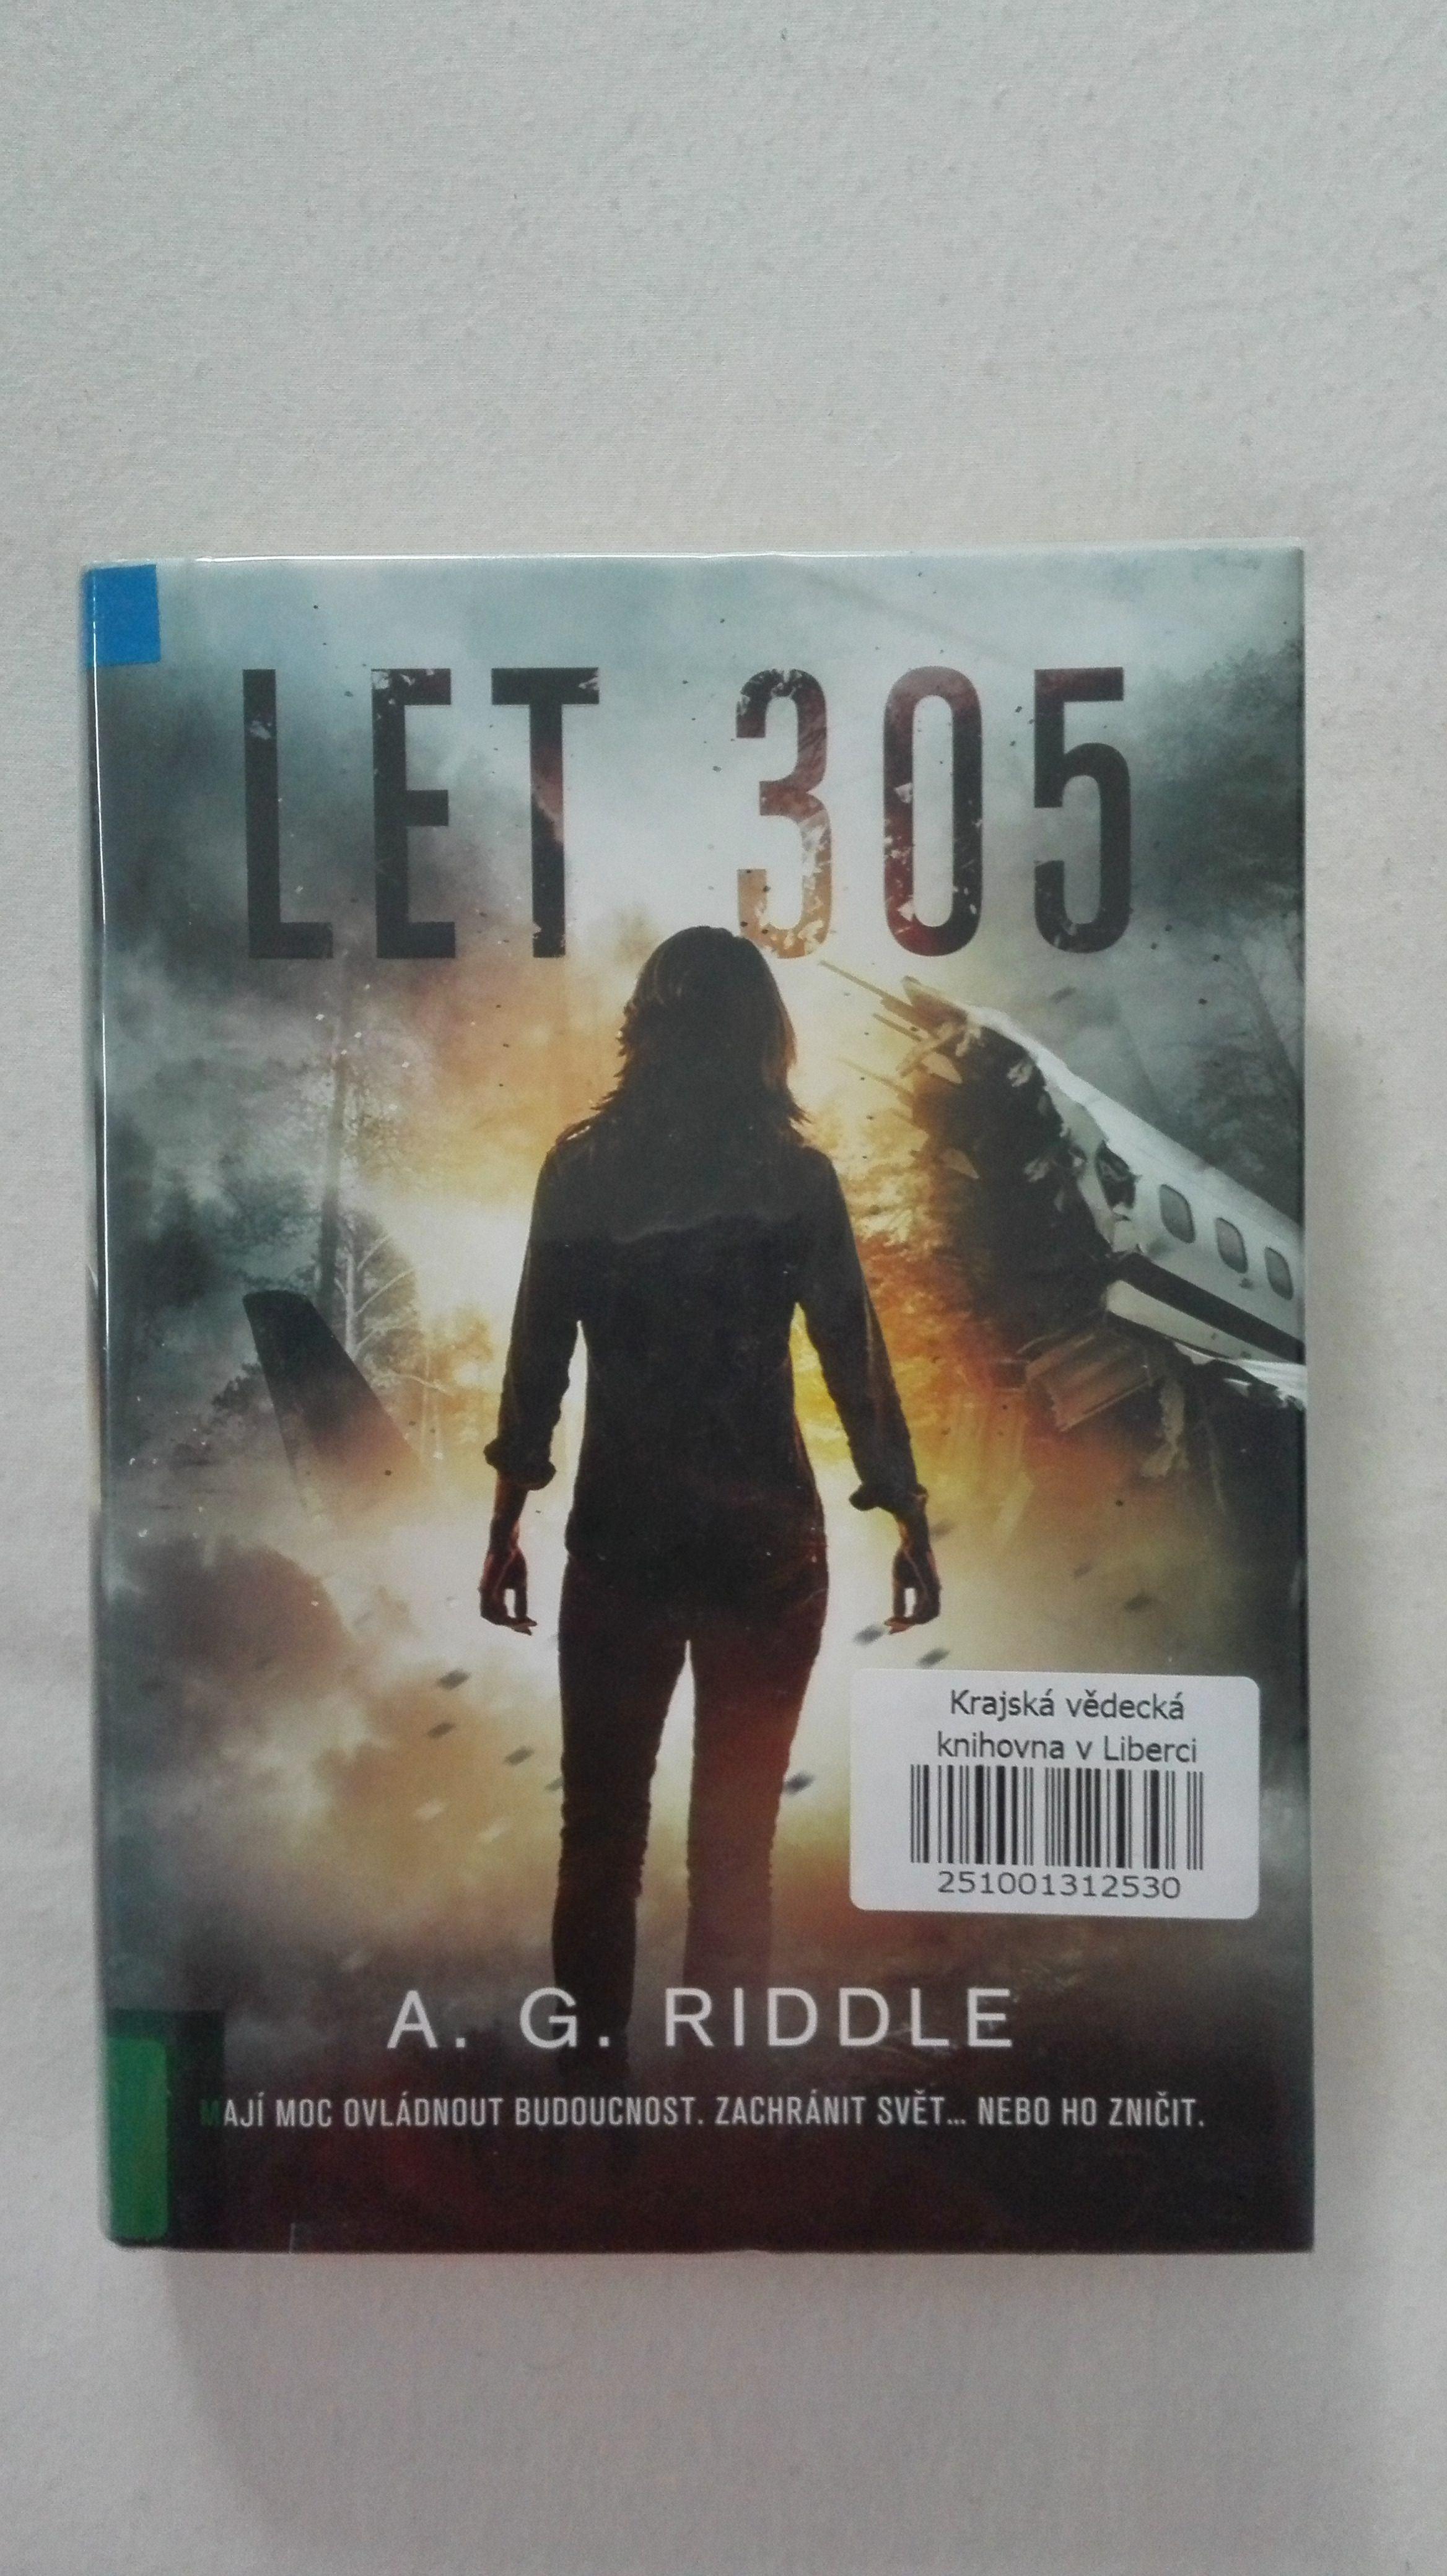 A.G.Riddle - Let 305